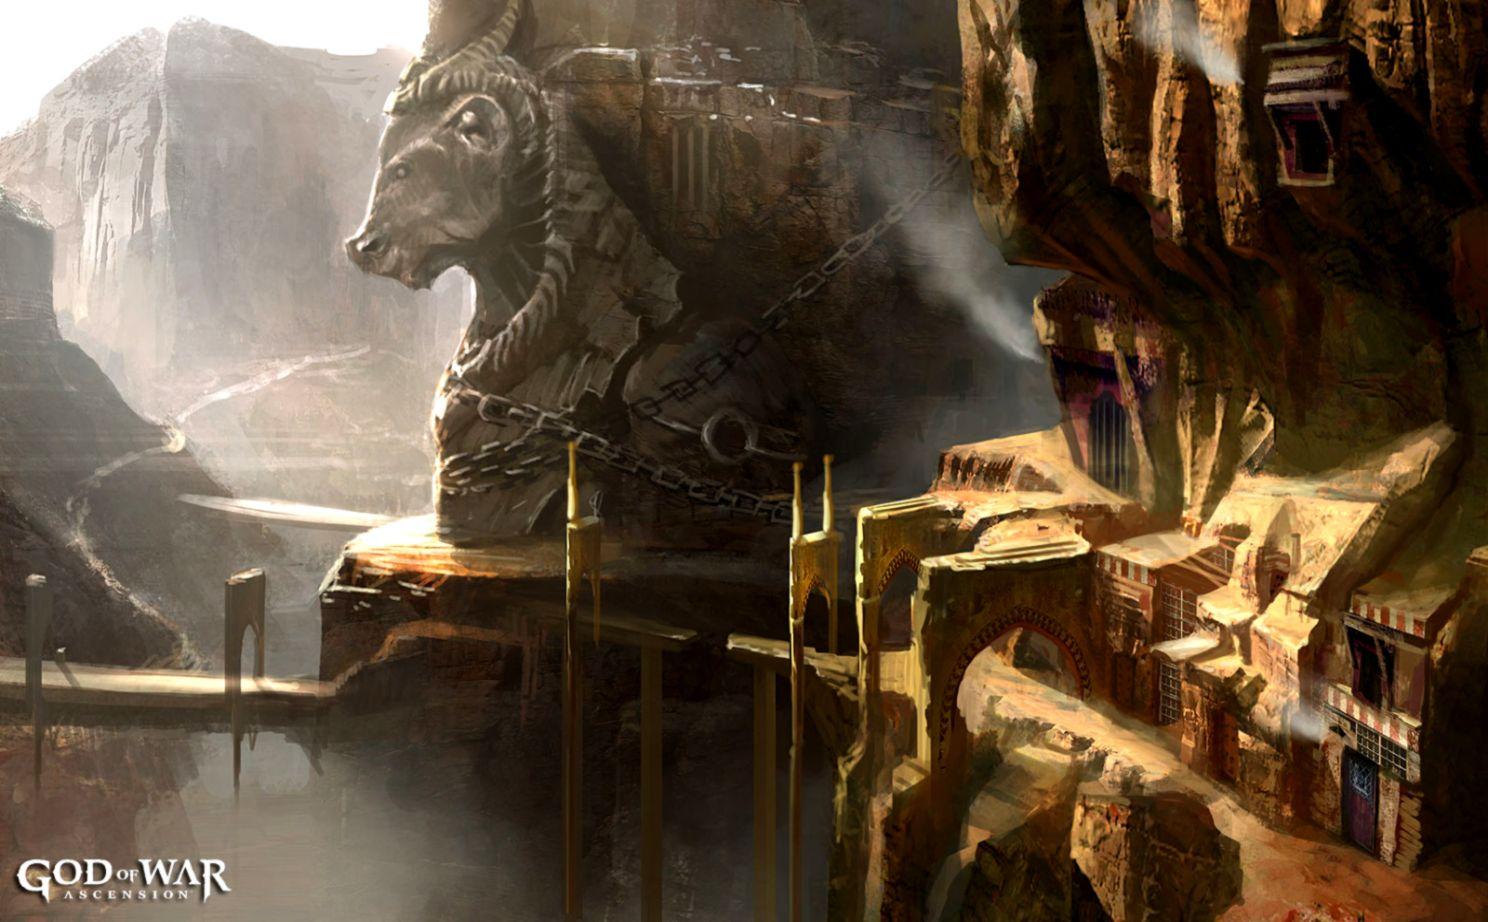 God Of War Ascension Wallpaper Posted By John Peltier